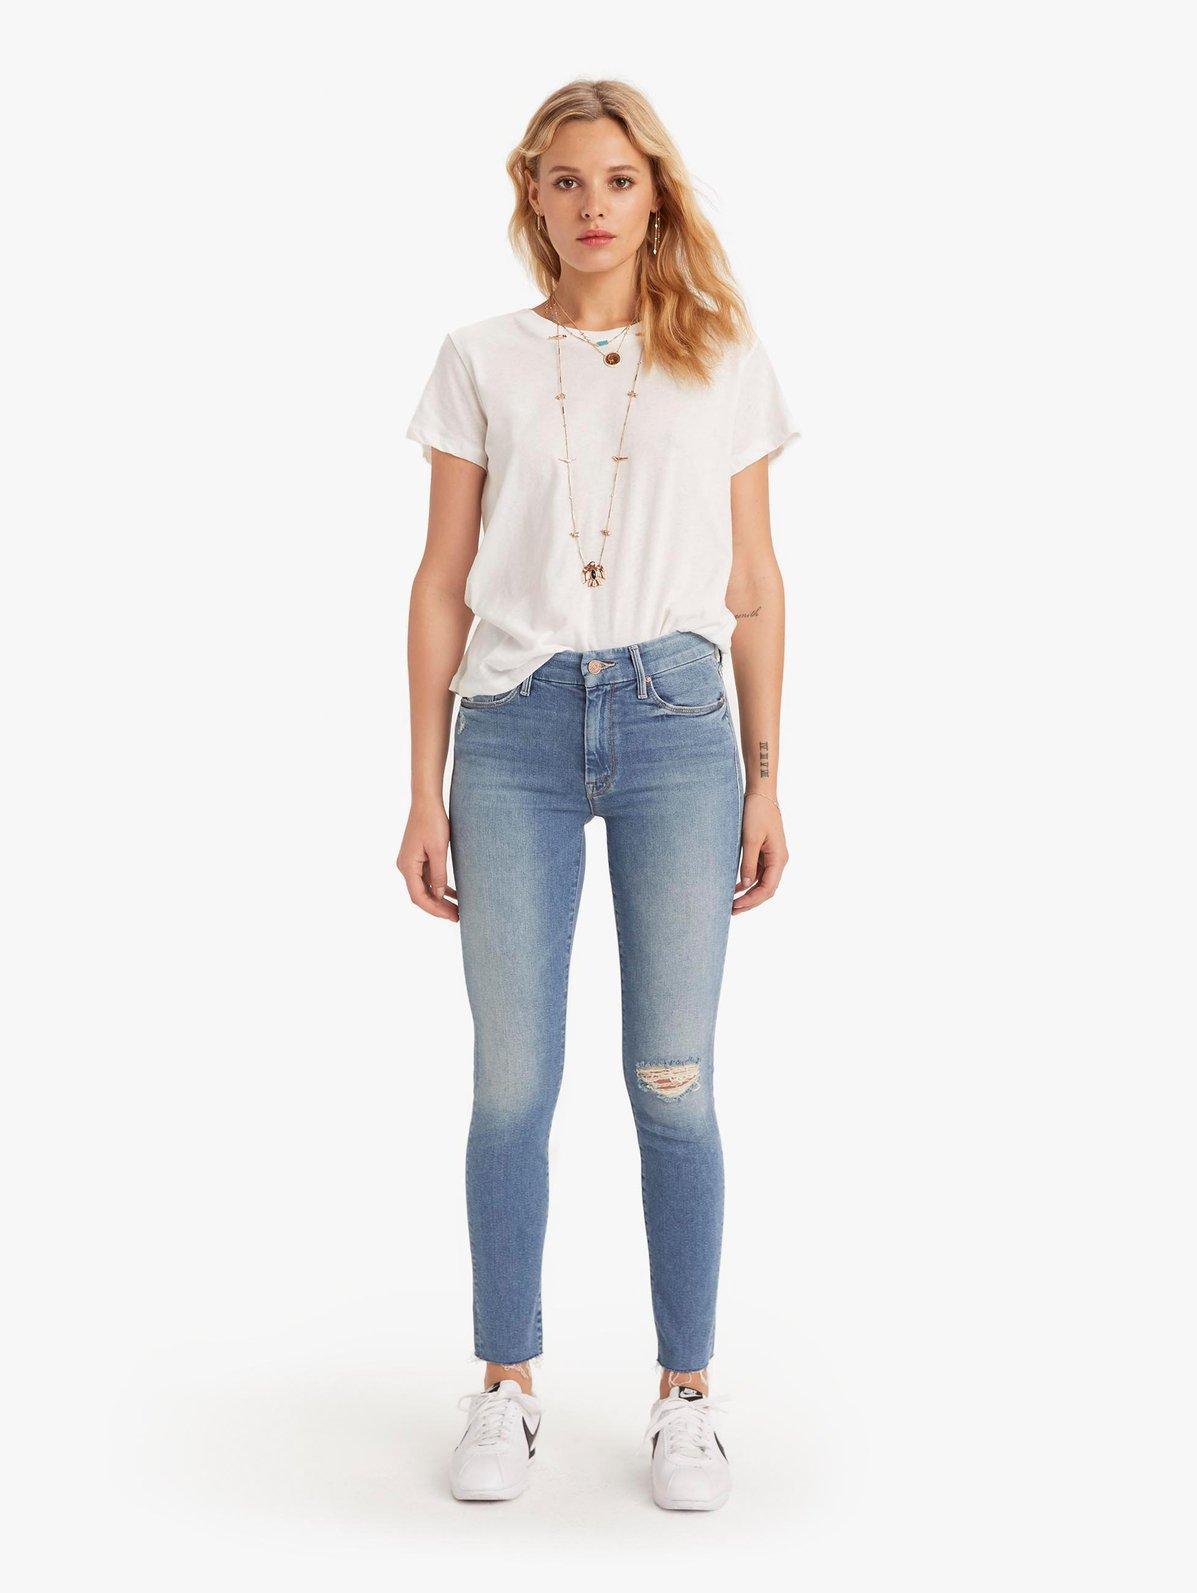 Meghan Markle Jeans